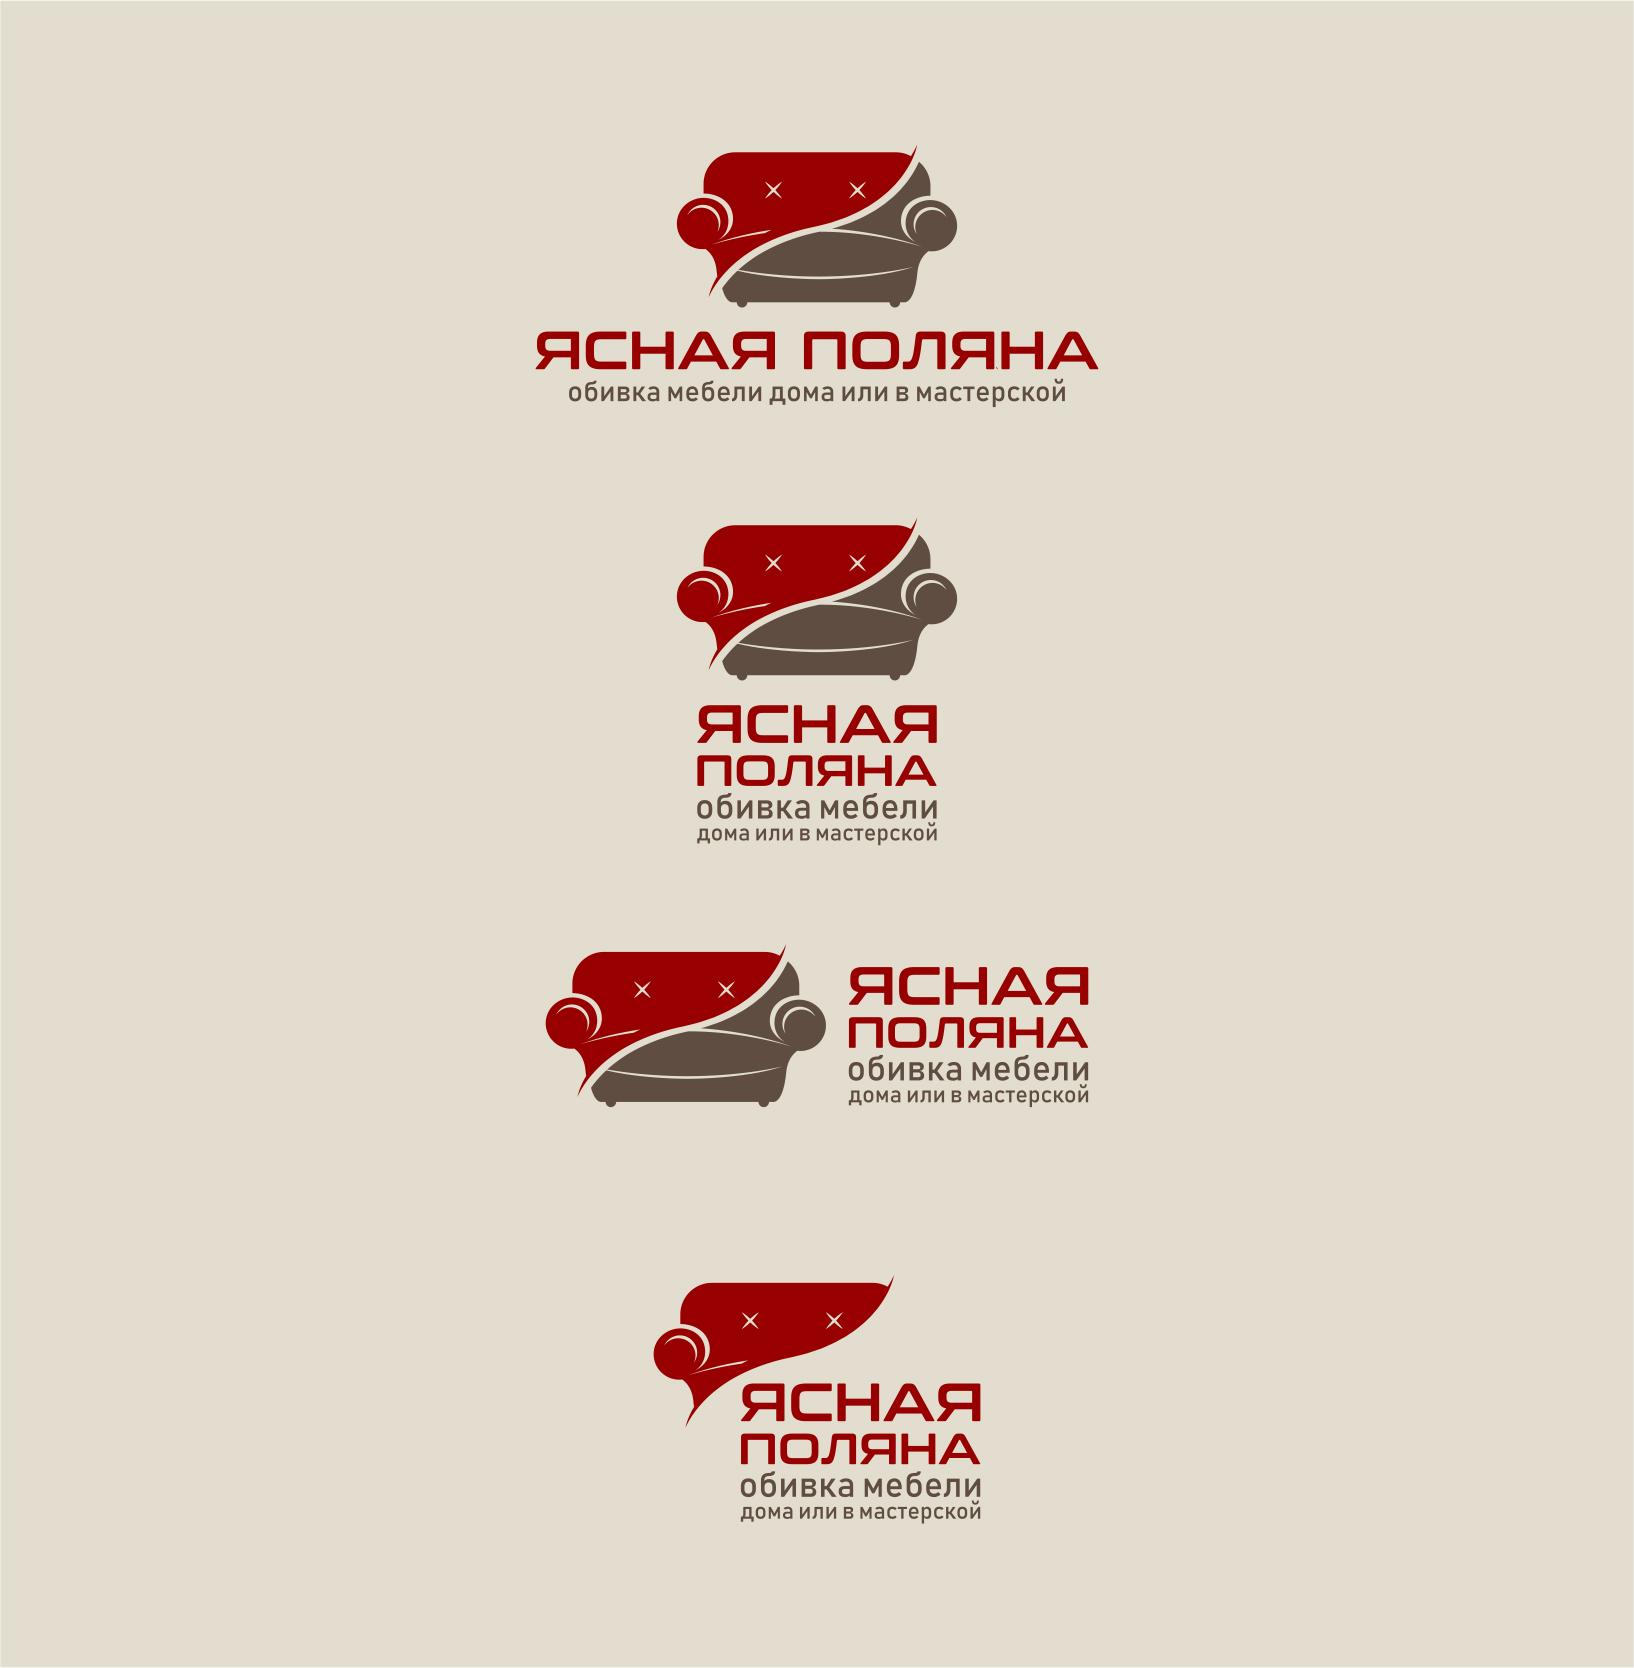 Логотип для сайта OBIVKA.RU фото f_3125c10fce308c4c.jpg